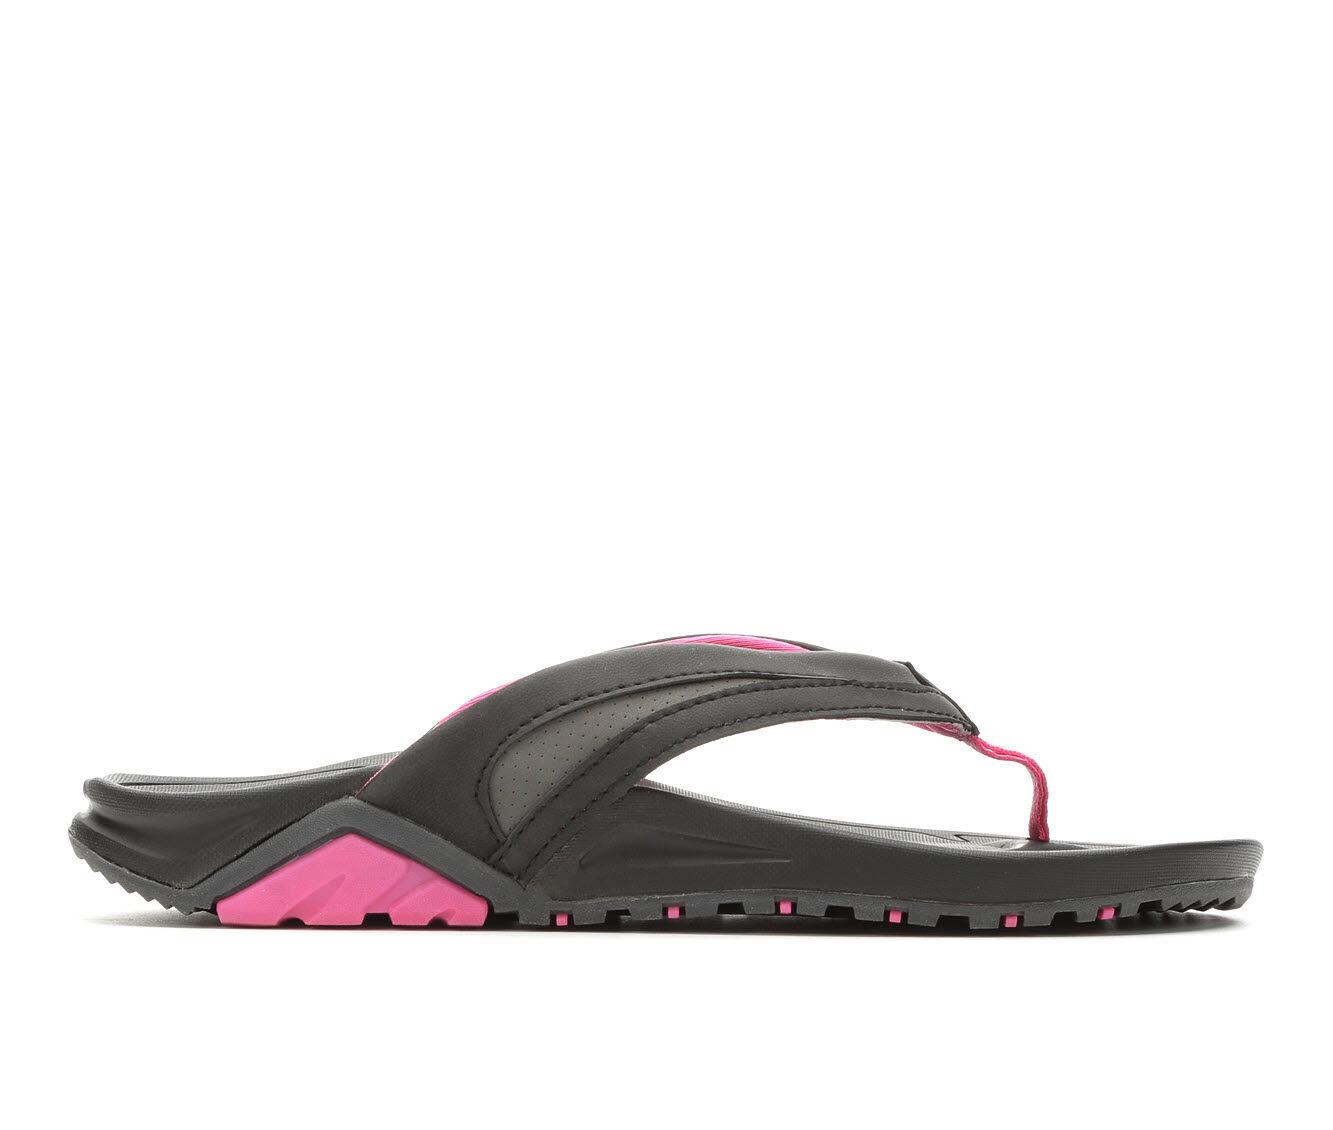 Women's Body Glove Sway Flip-Flops Black/Flamingo